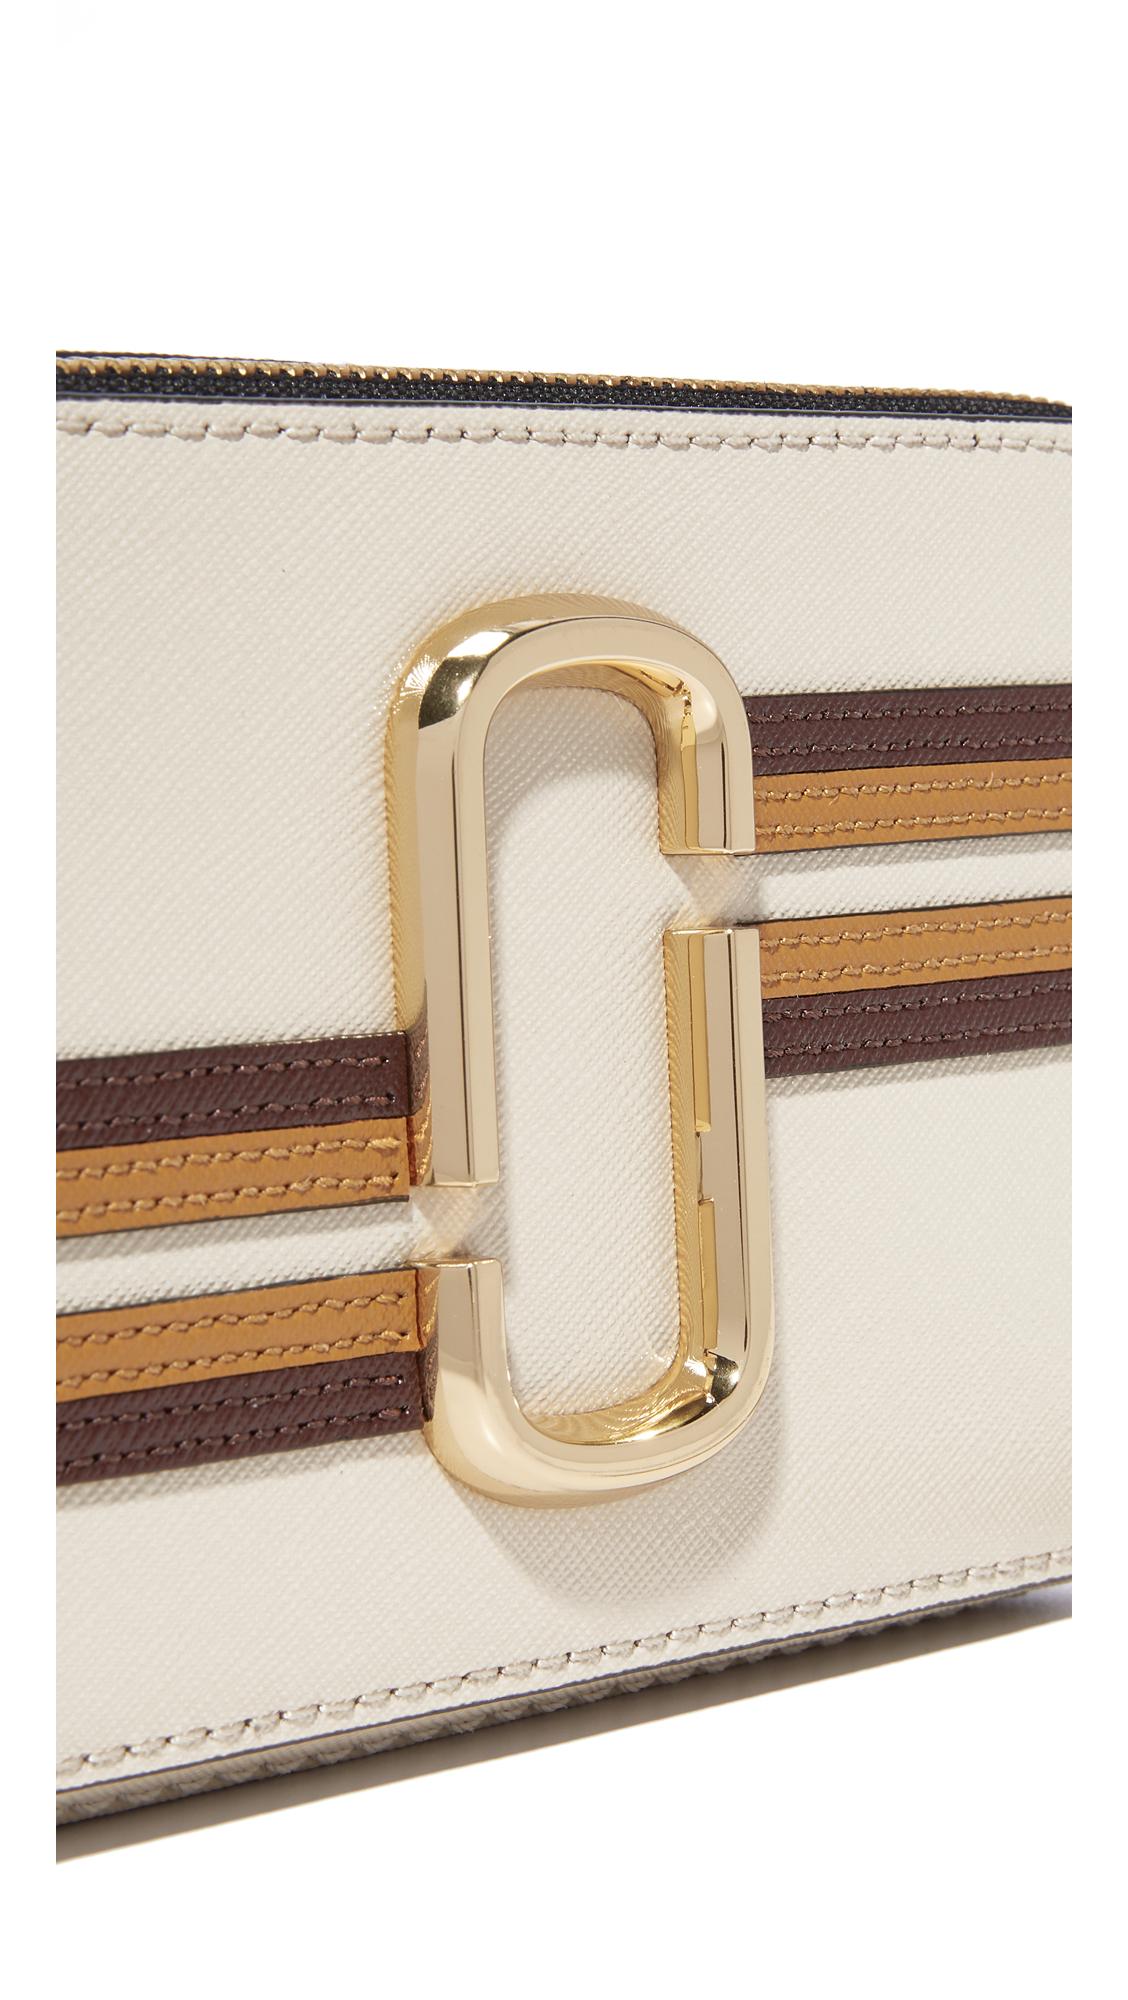 27cd6762ba52 Marc Jacobs Stripe Snapshot Camera Bag